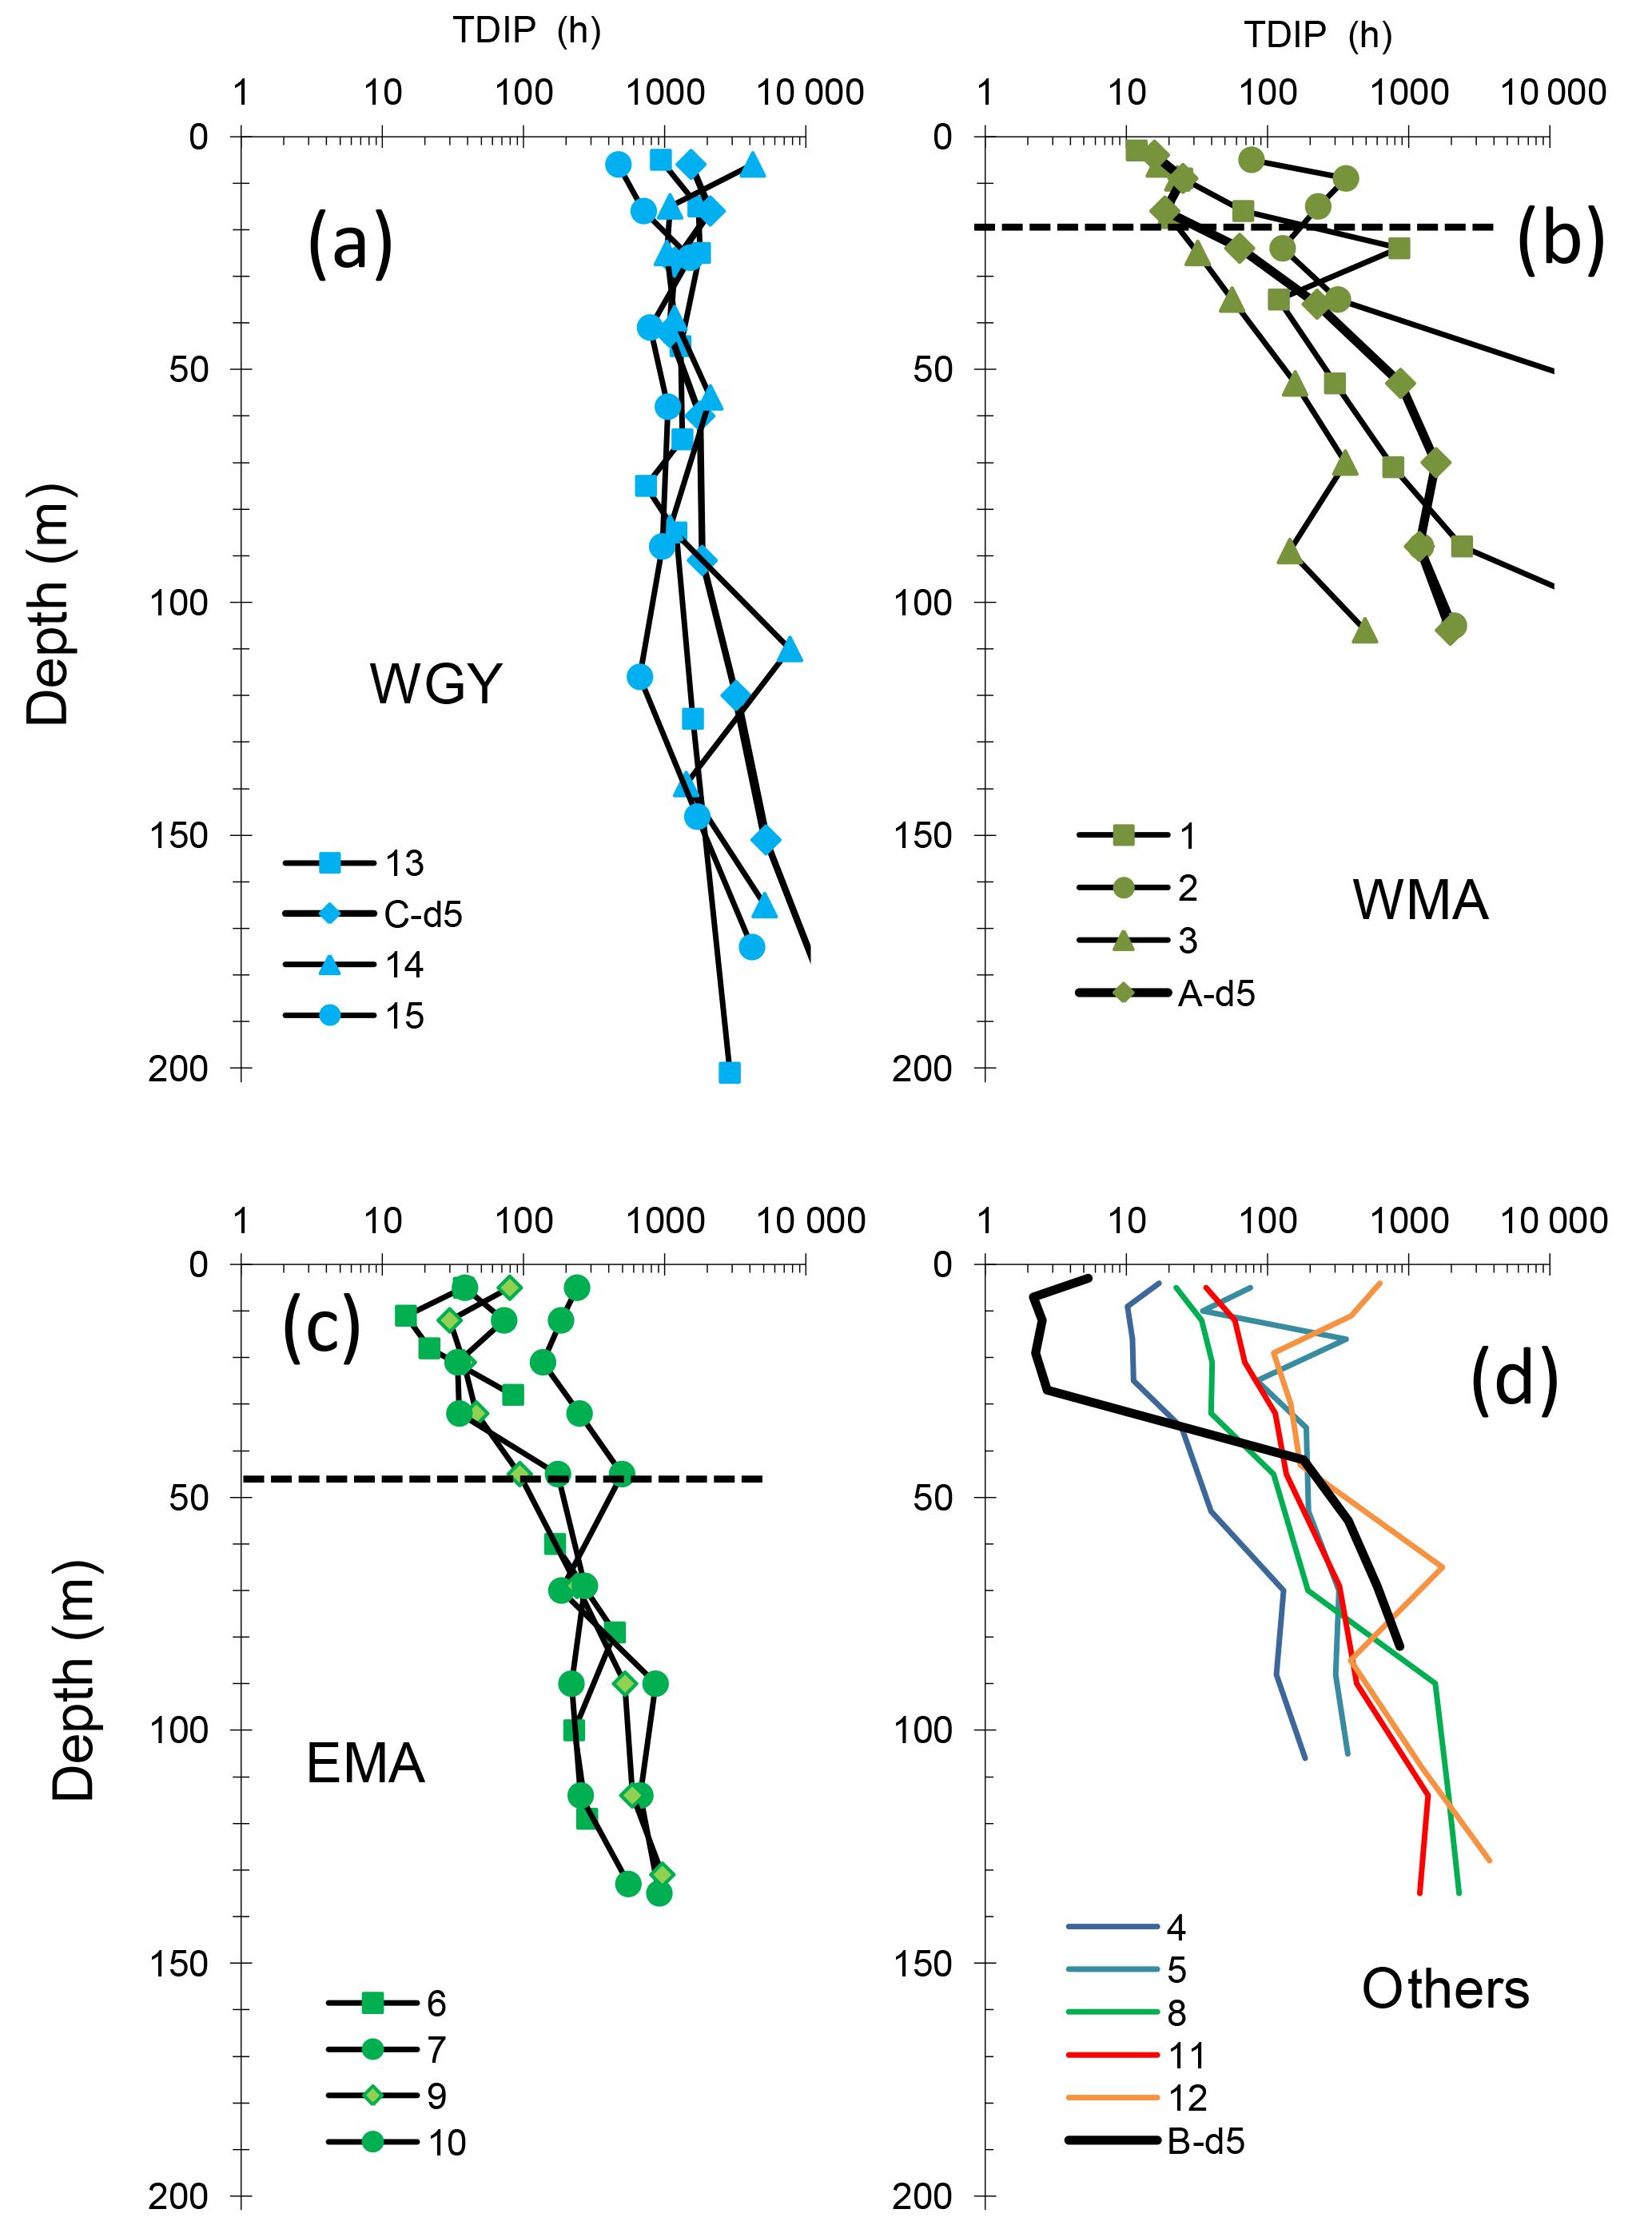 BG - Dynamics and controls of heterotrophic prokaryotic production